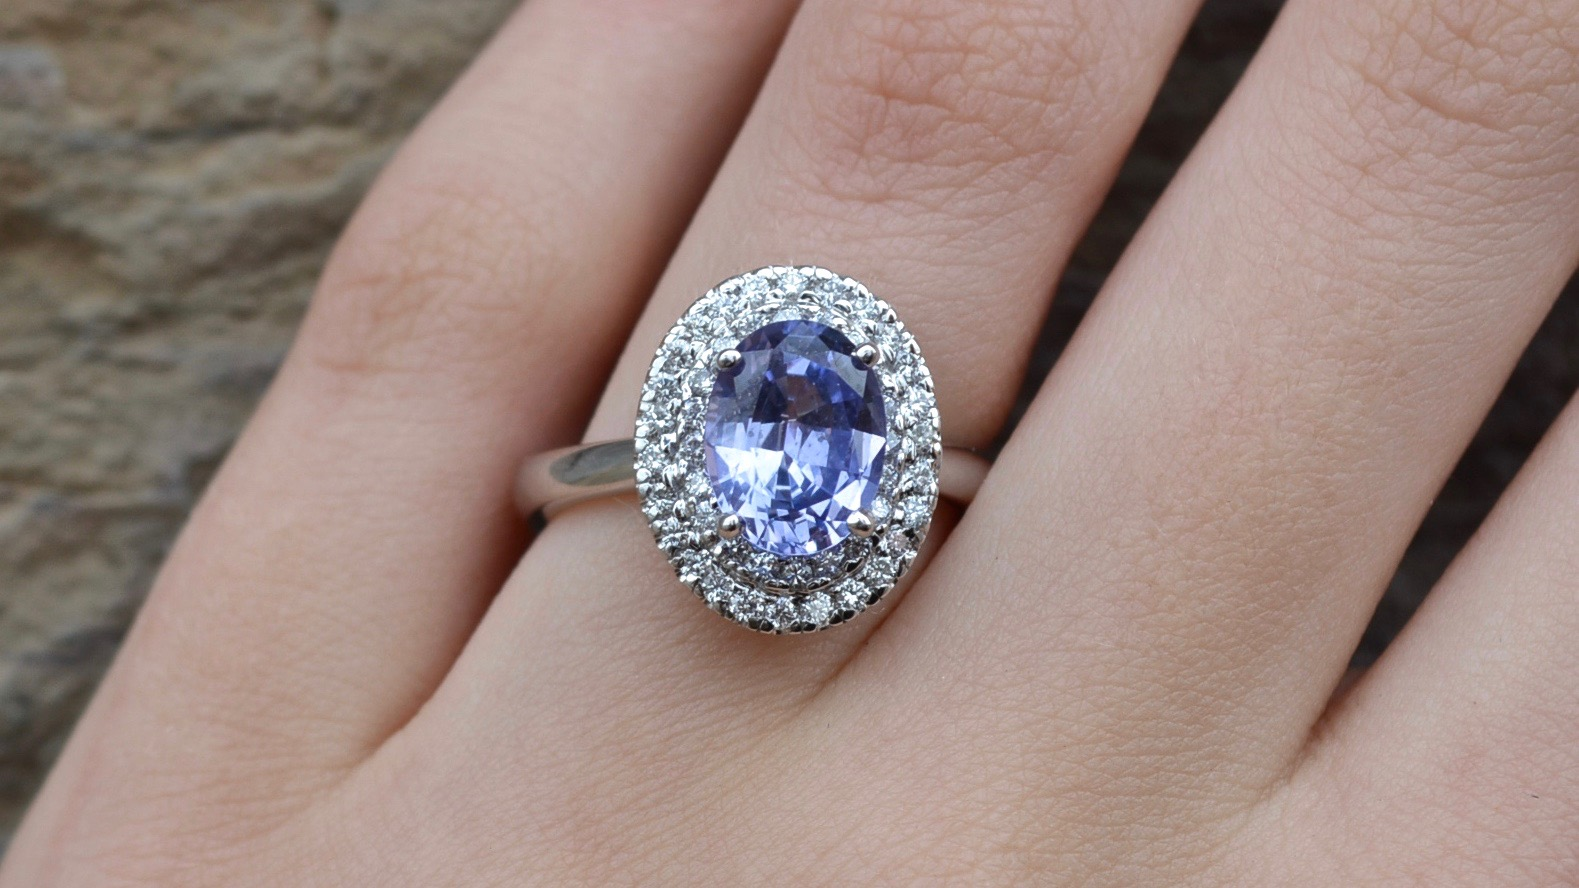 Mauve Sapphire with double halo